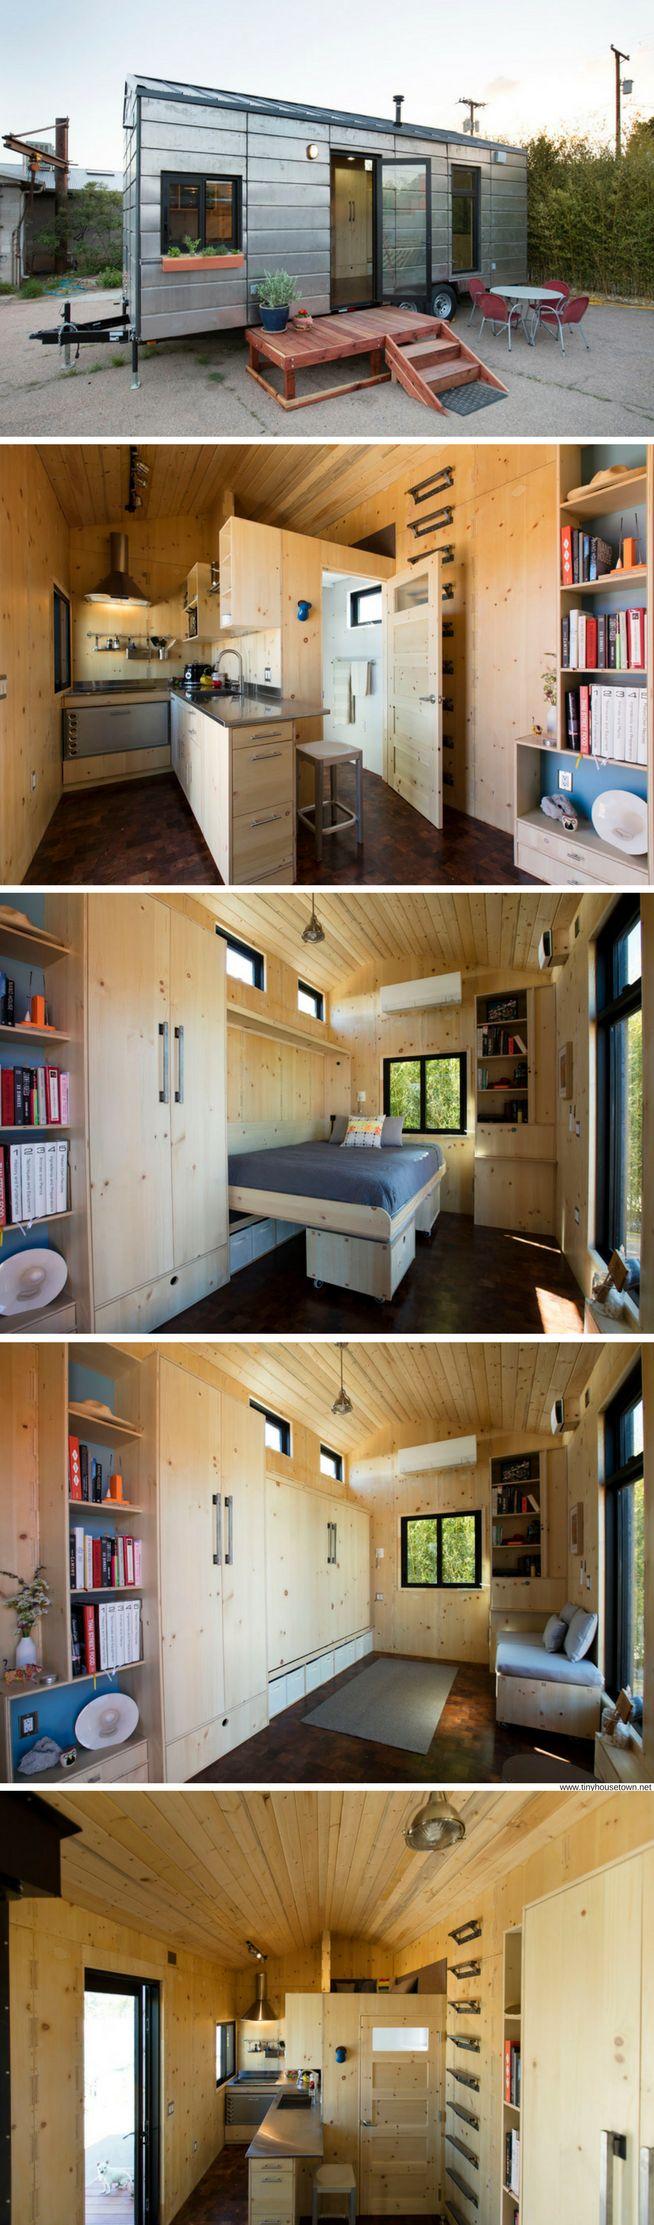 The Saltbox tiny house